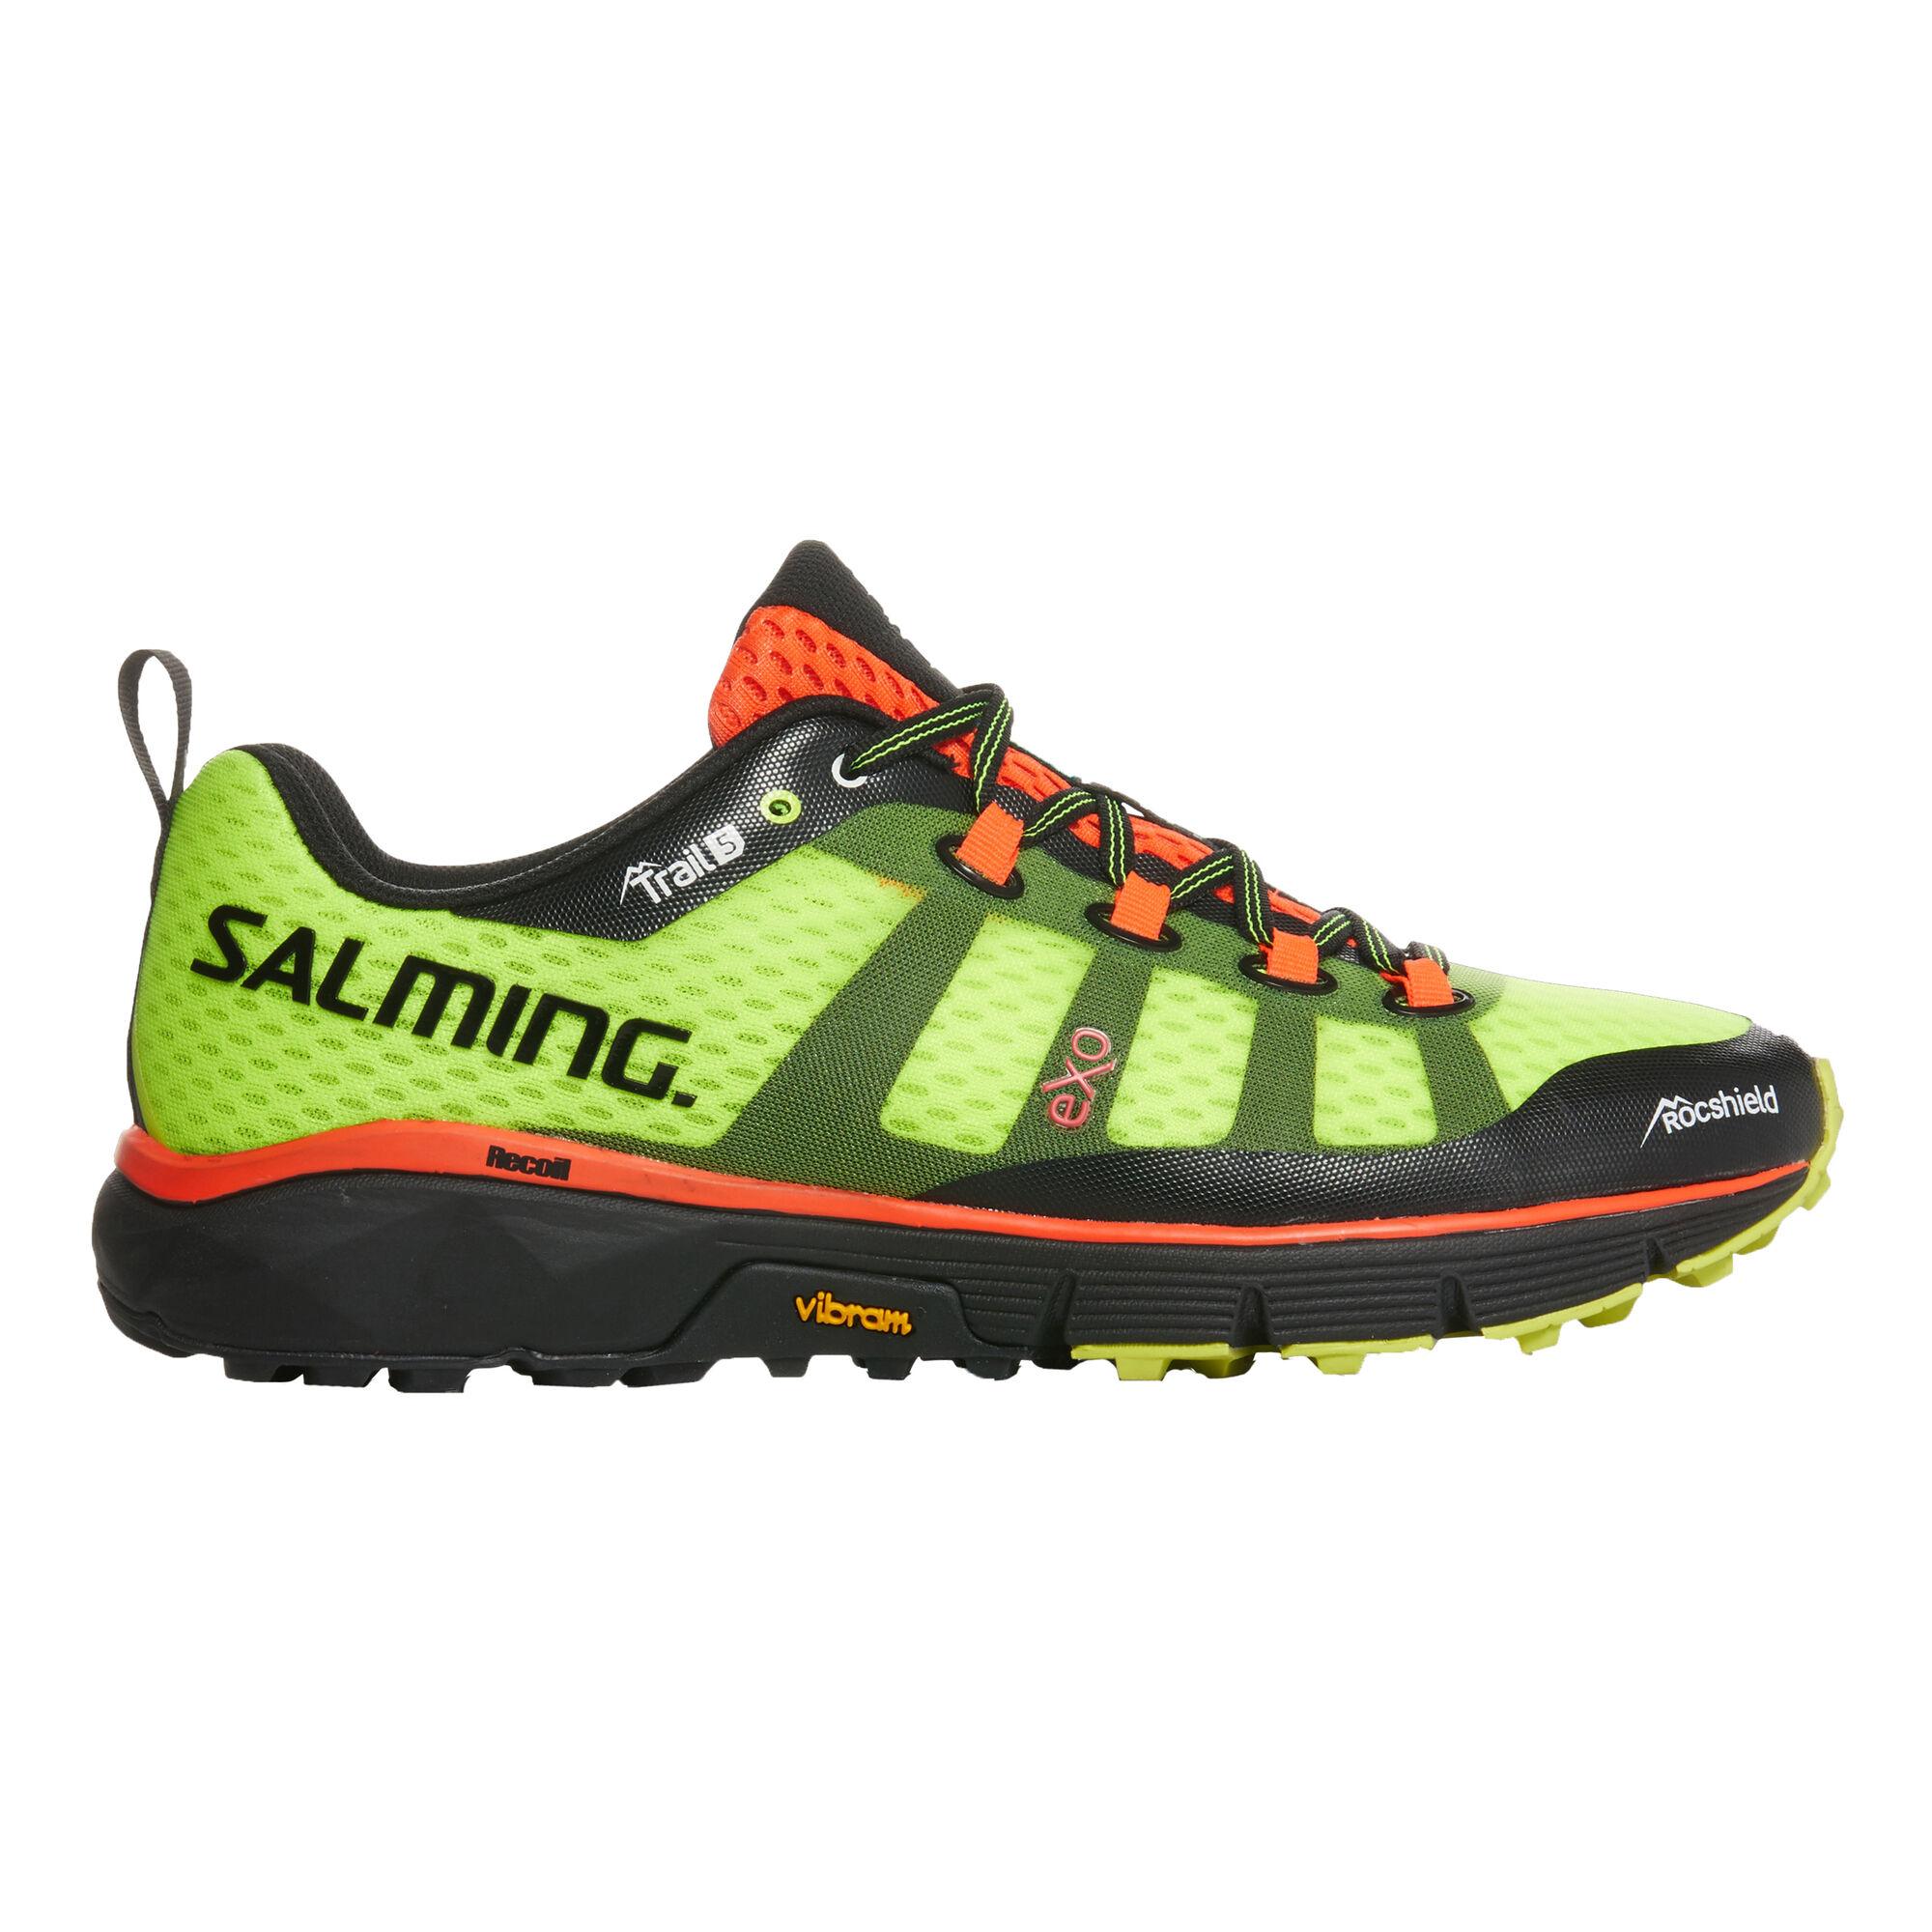 47a57c56fa2c5d Salming  Salming  Salming  Salming  Salming  Salming  Salming. Trail 5 Men  ...